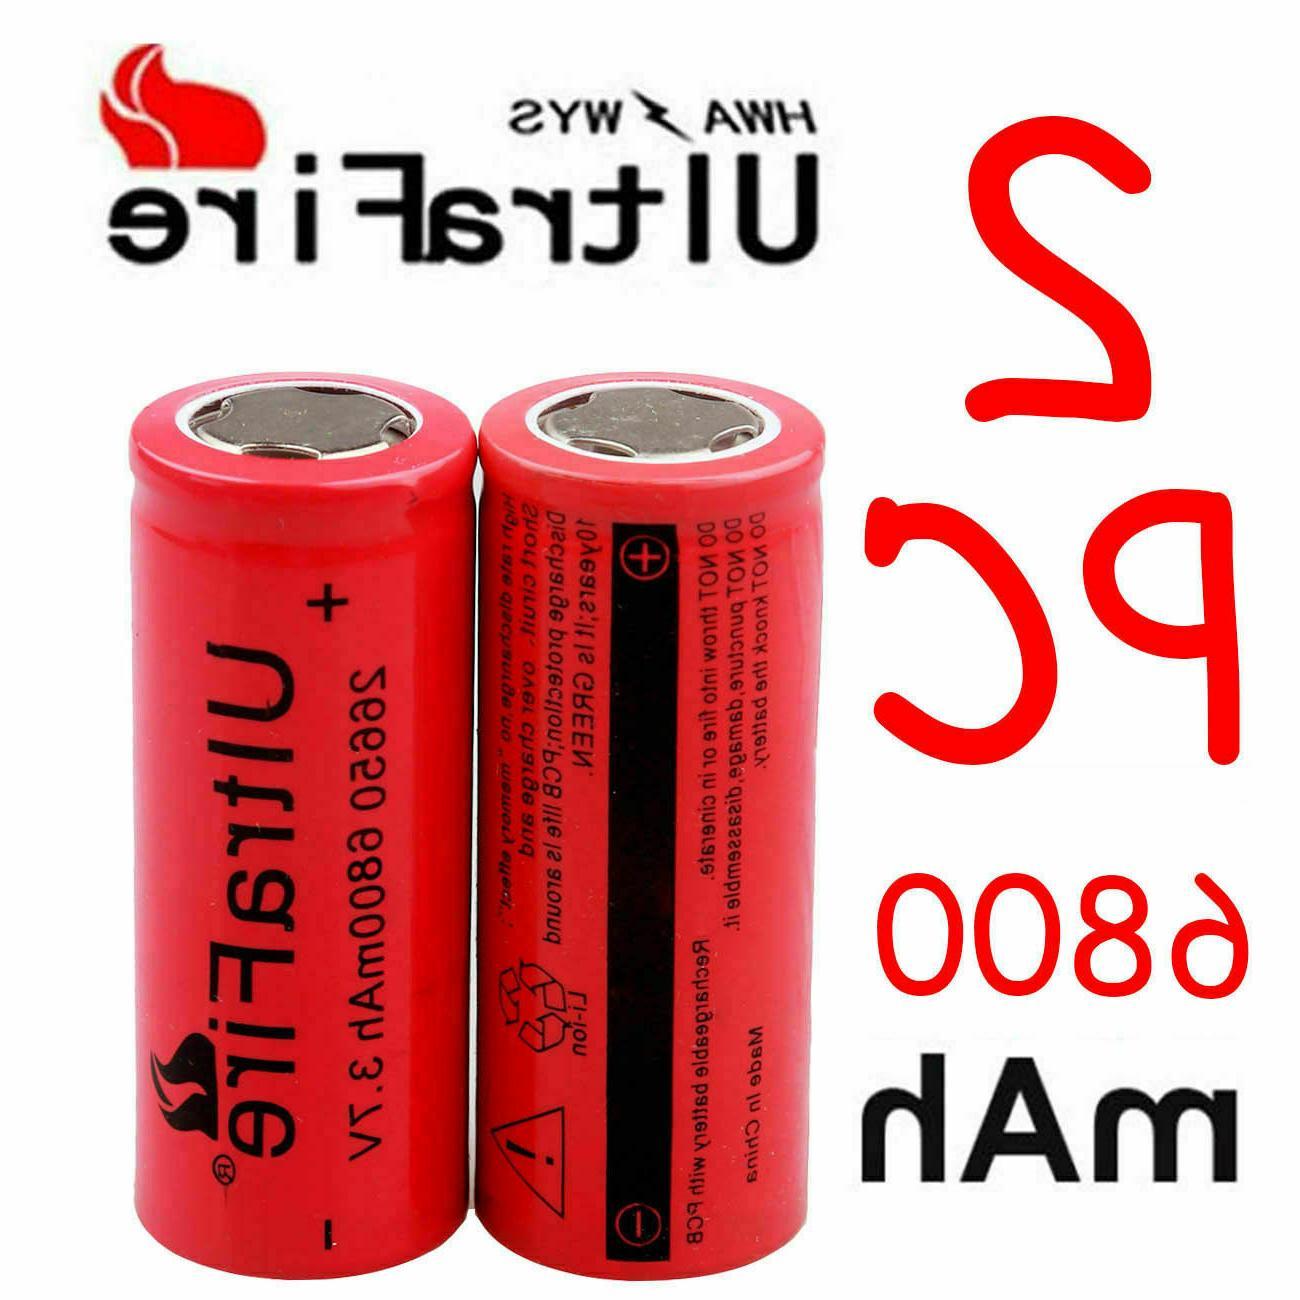 26650 Battery 6800mAh Flat Top Li-ion Batteries